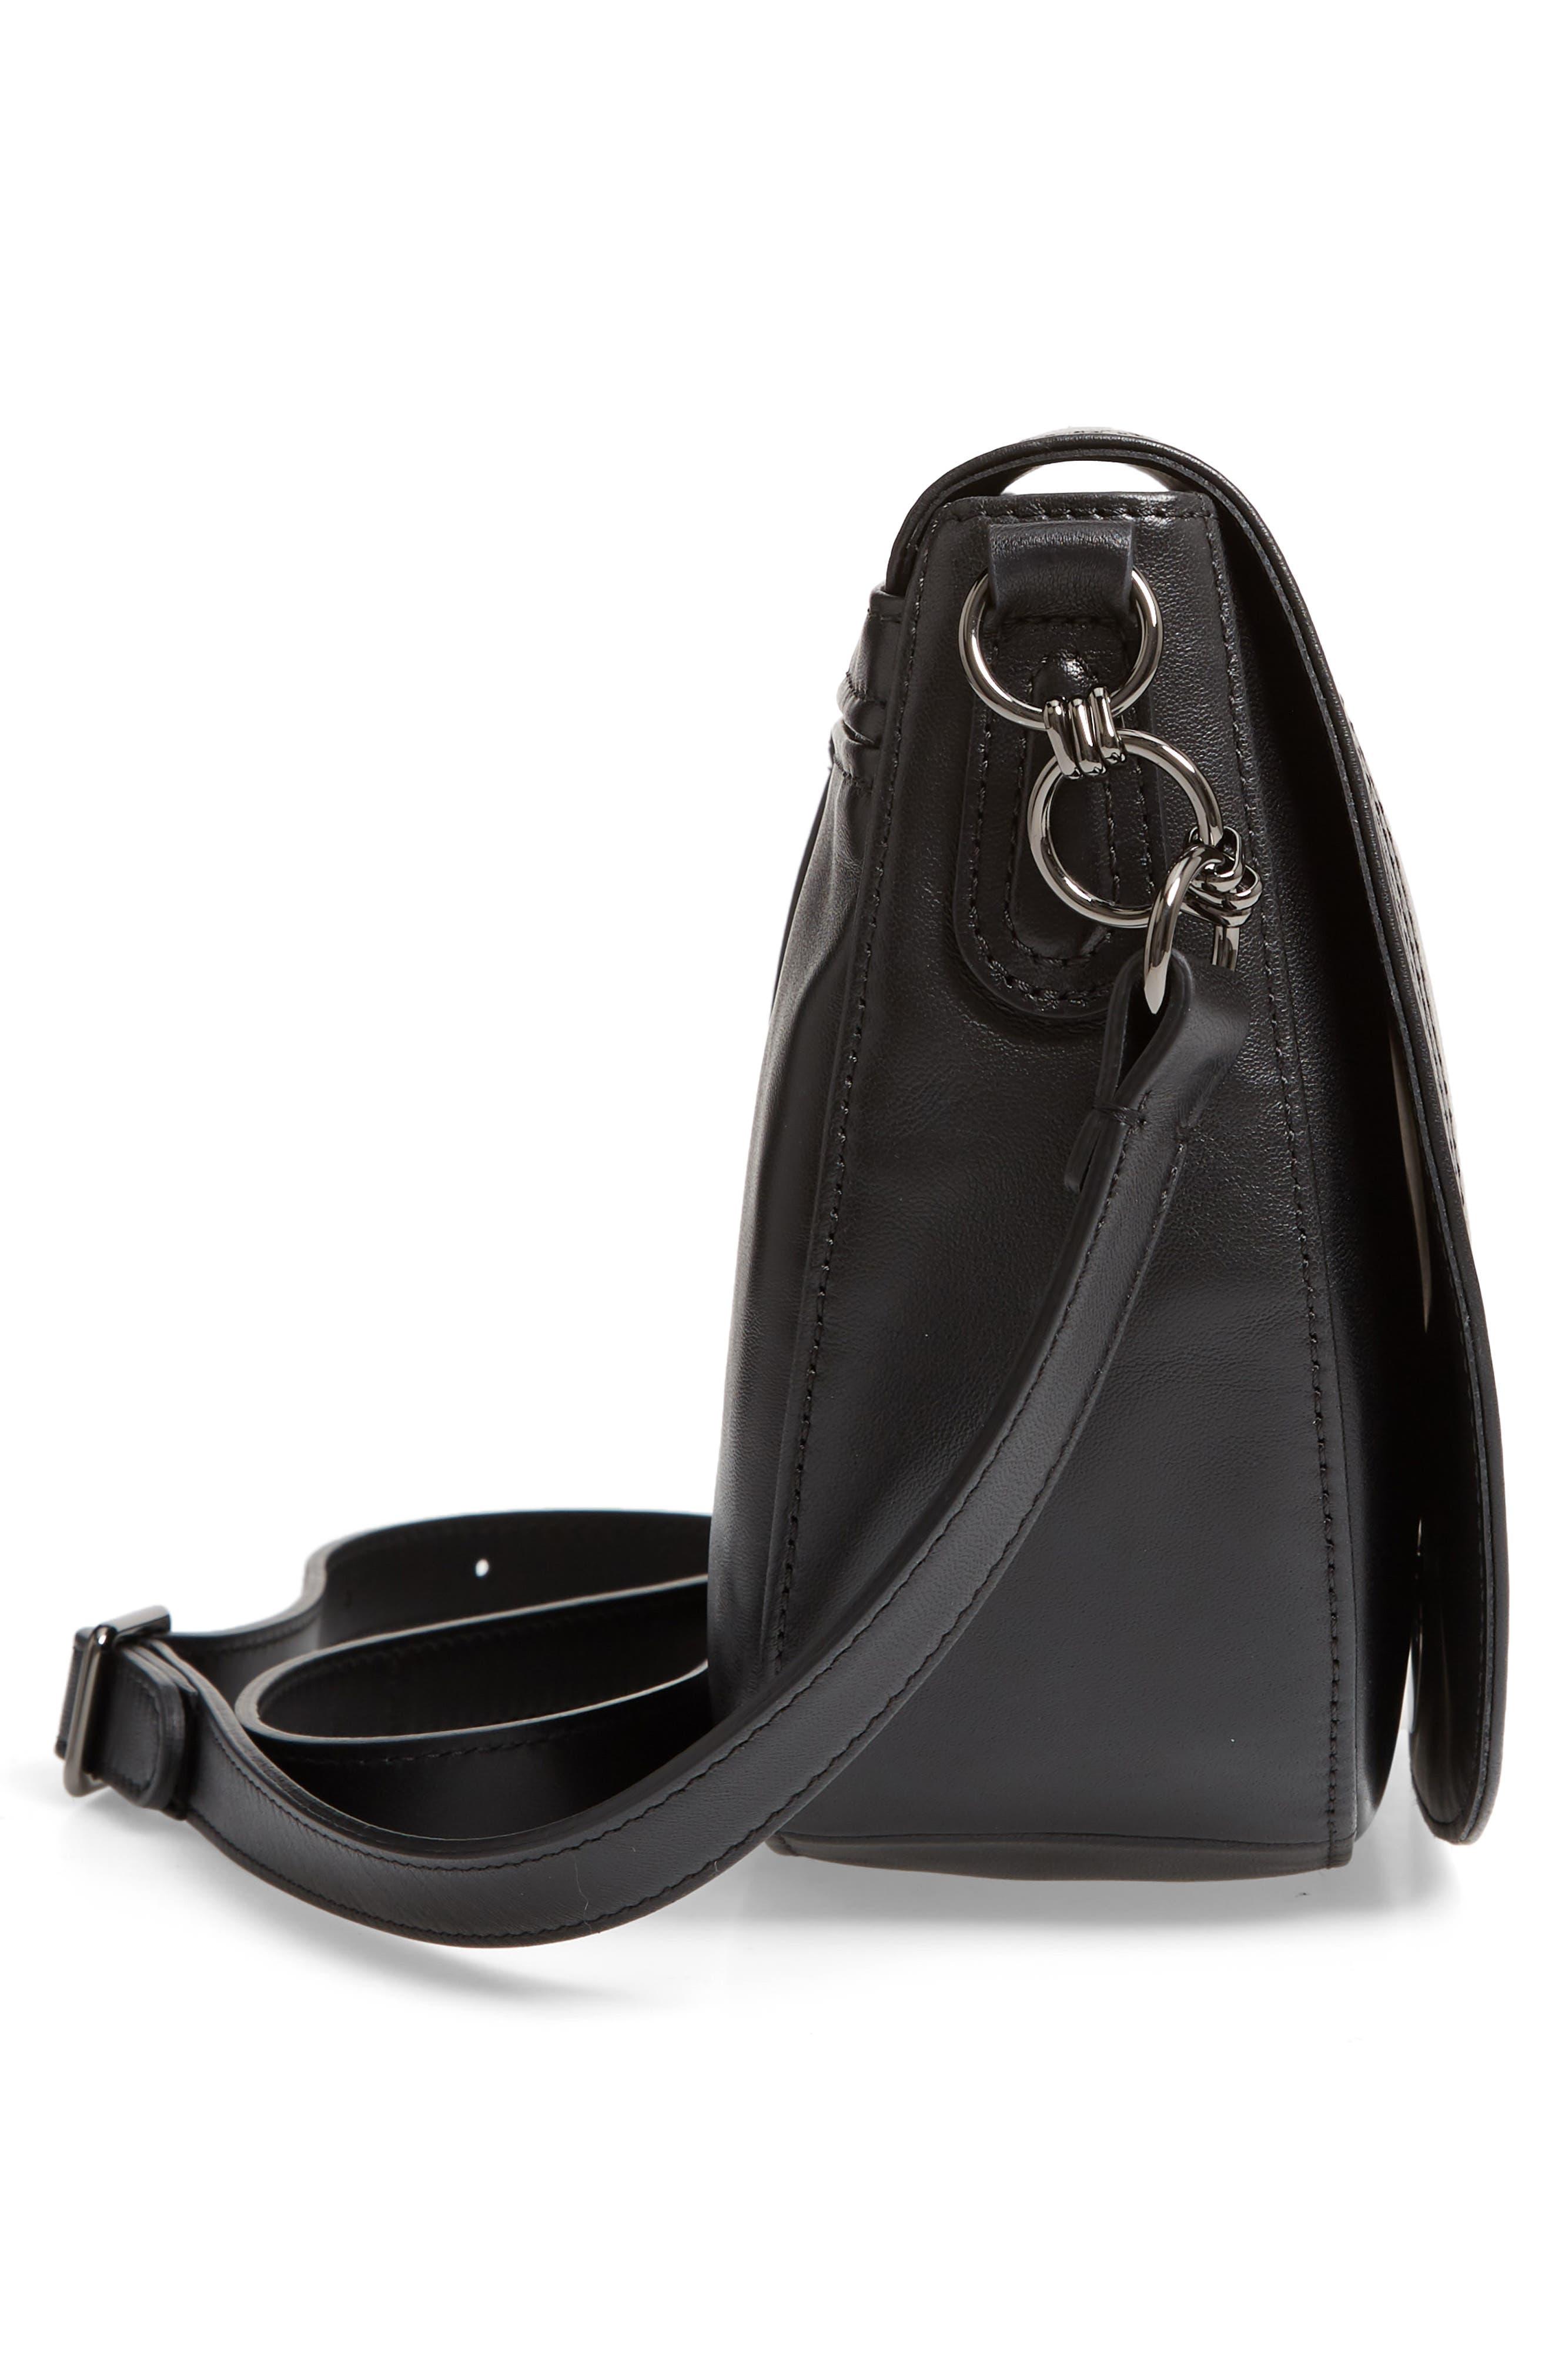 Medium Cavalcade Leather Saddle Bag,                             Alternate thumbnail 5, color,                             BLACK